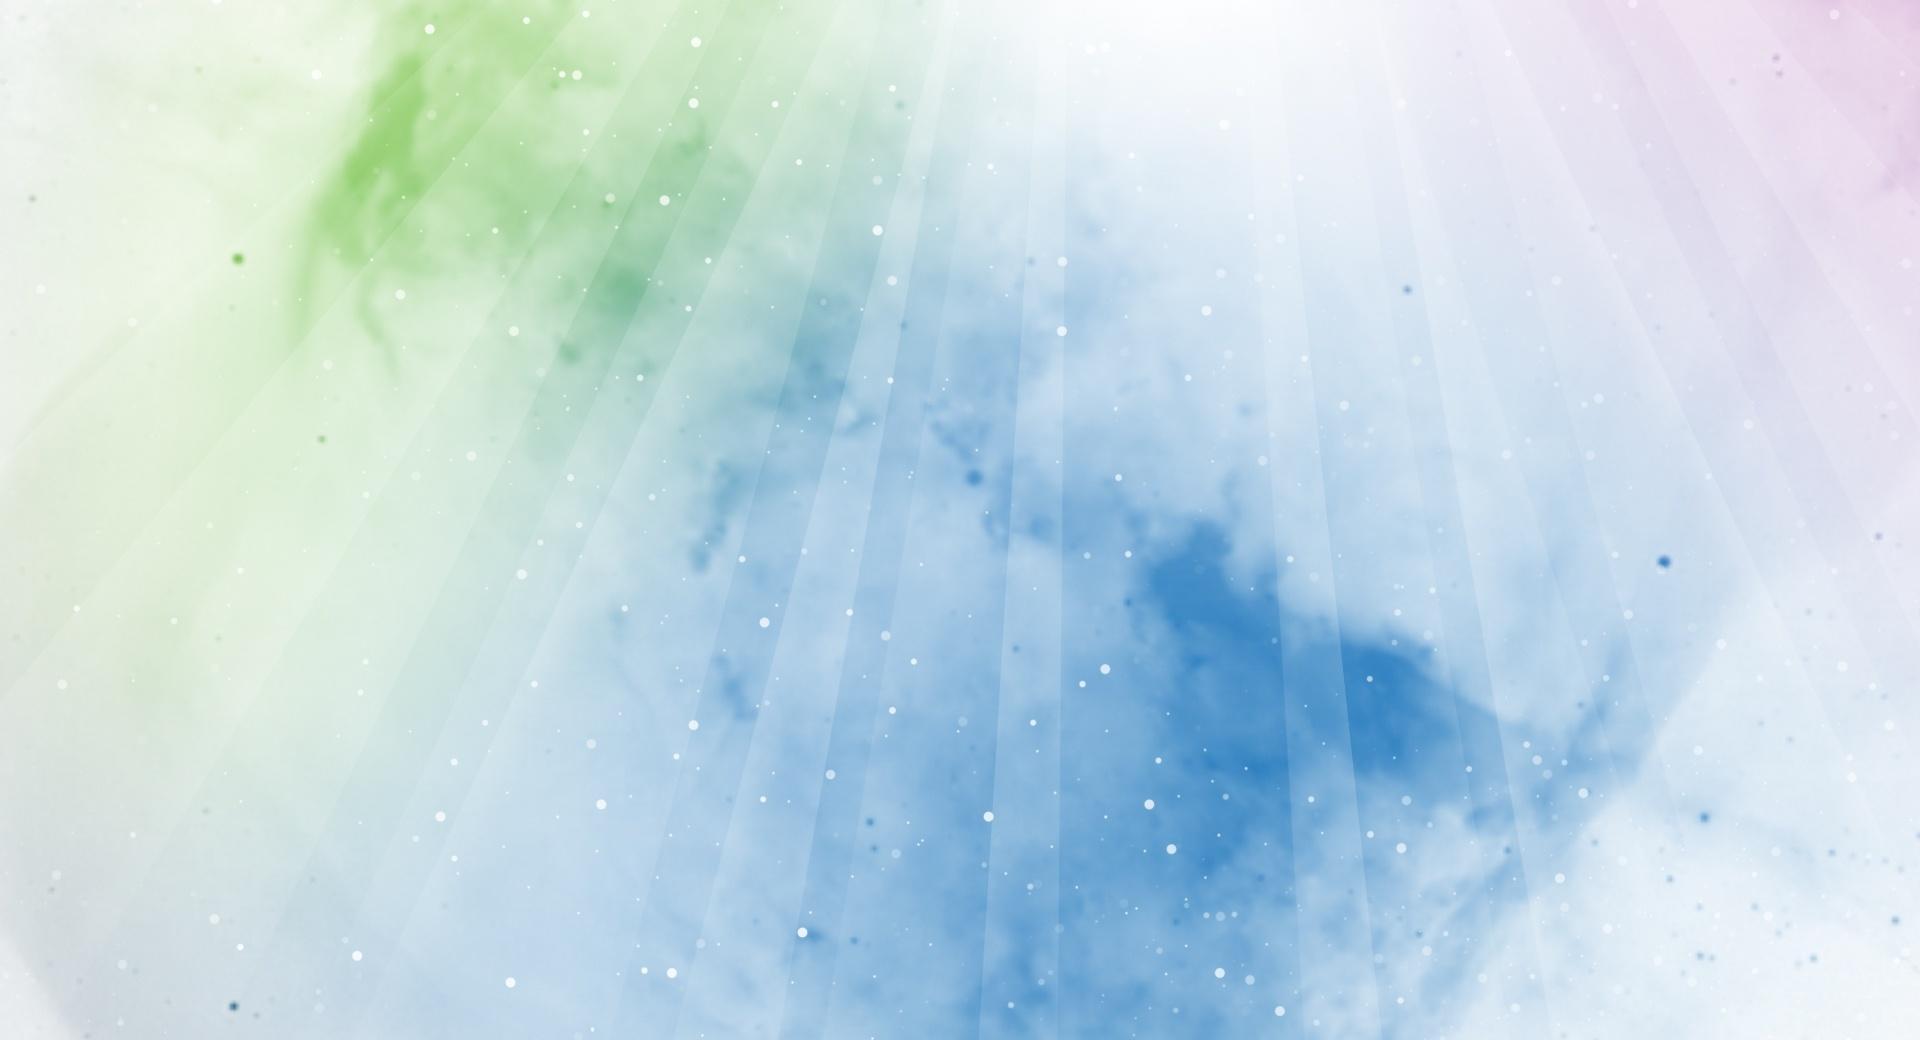 Abstract Snowfall wallpapers HD quality